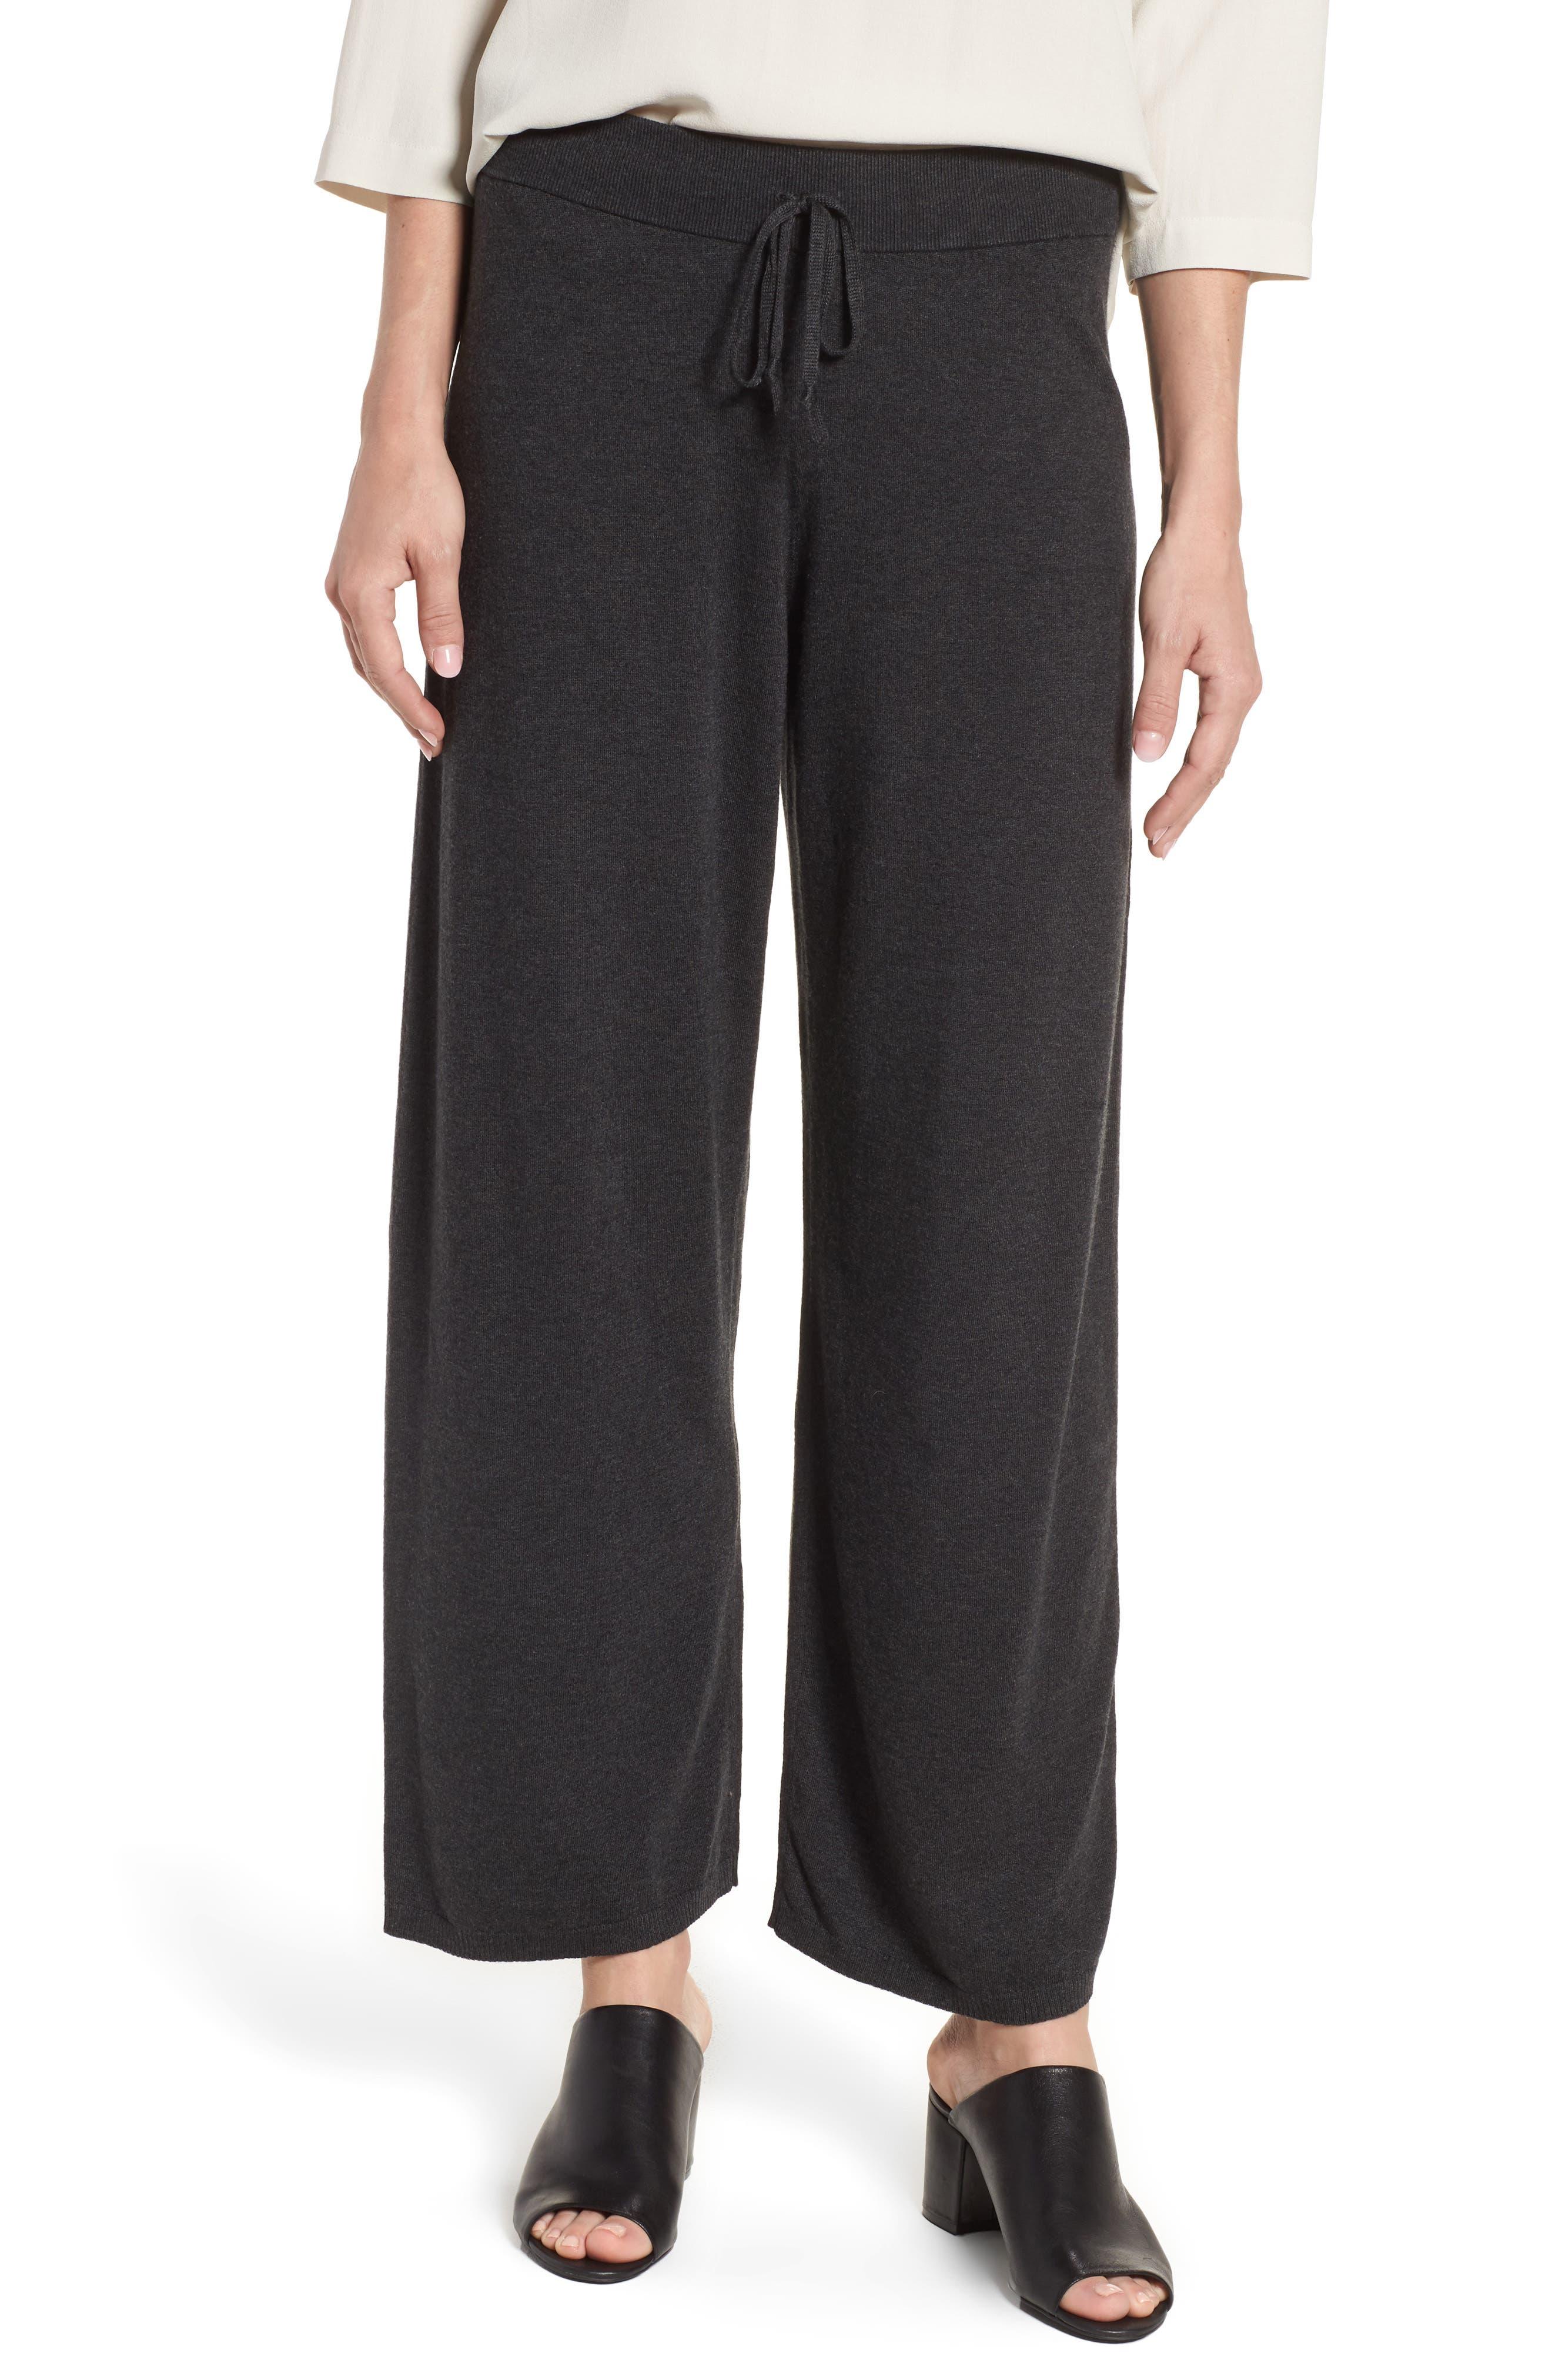 Tencel<sup>®</sup> Lyocell Blend Knit Wide Leg Pants,                             Main thumbnail 1, color,